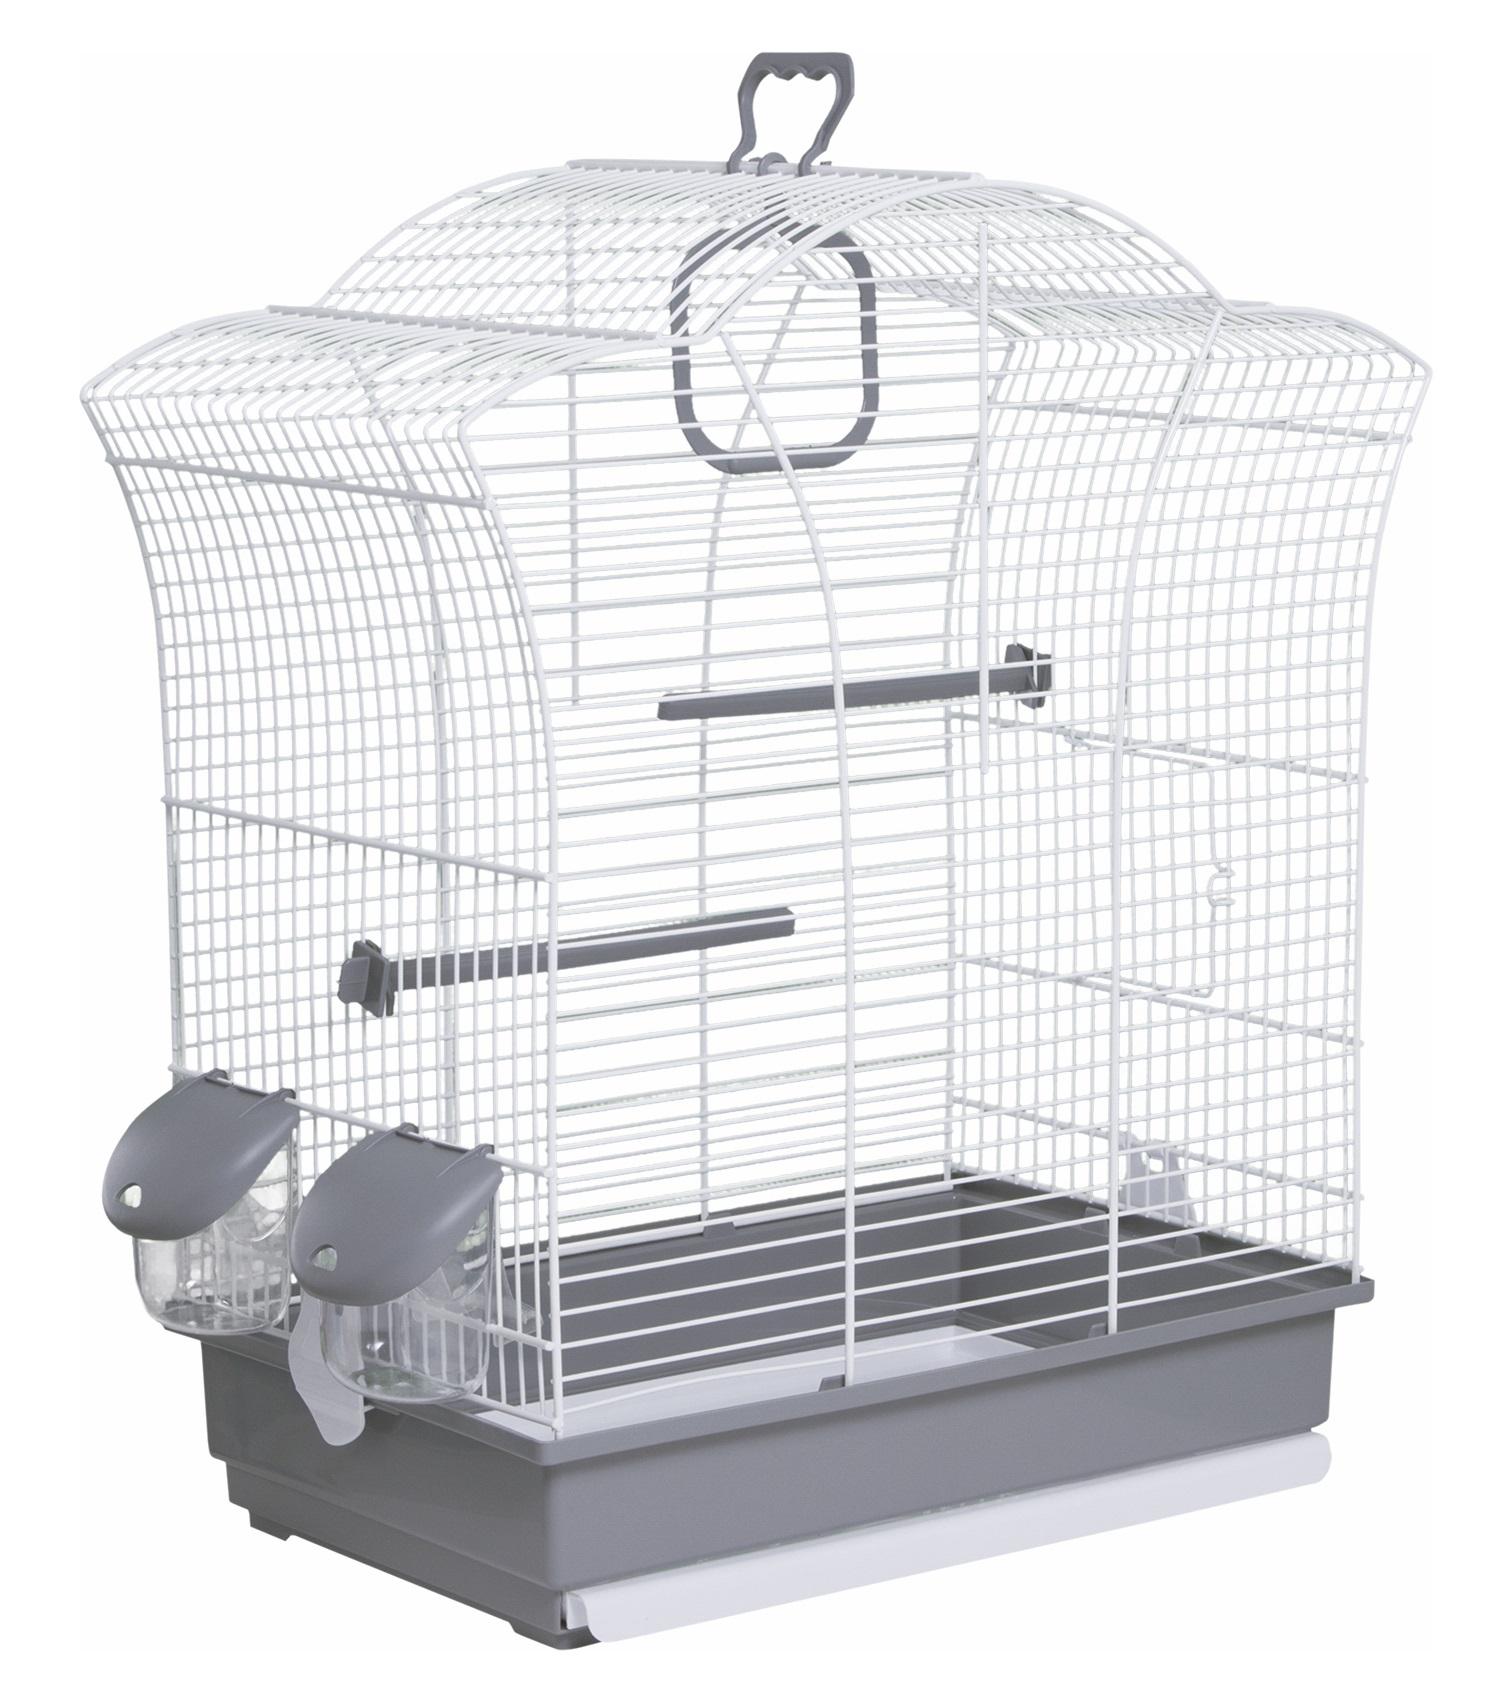 Клетка для птиц Voltrega (649) цвет белый/серый